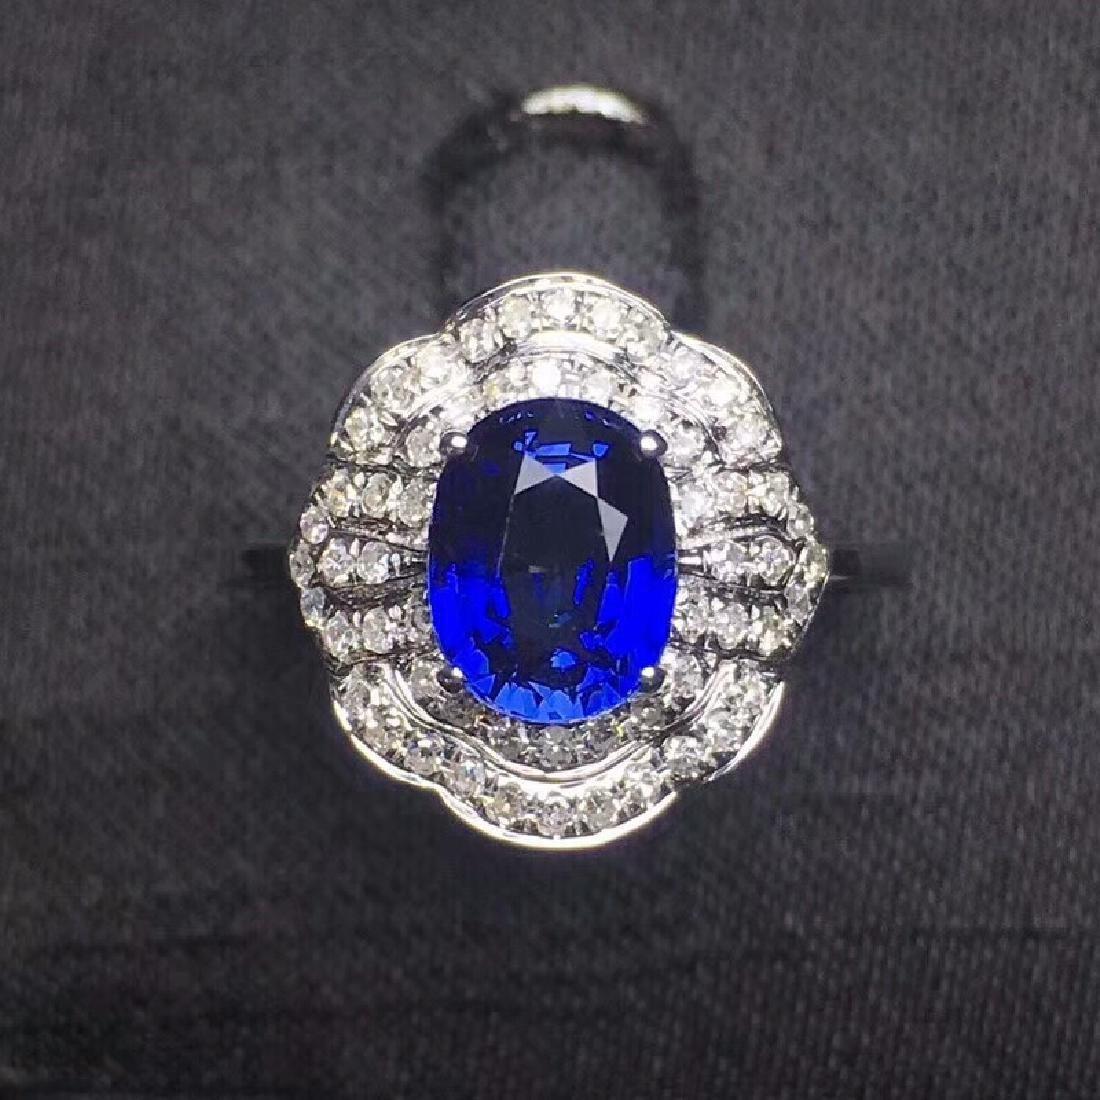 2.14 CTW Sapphire & VS Diamond Ring 18K